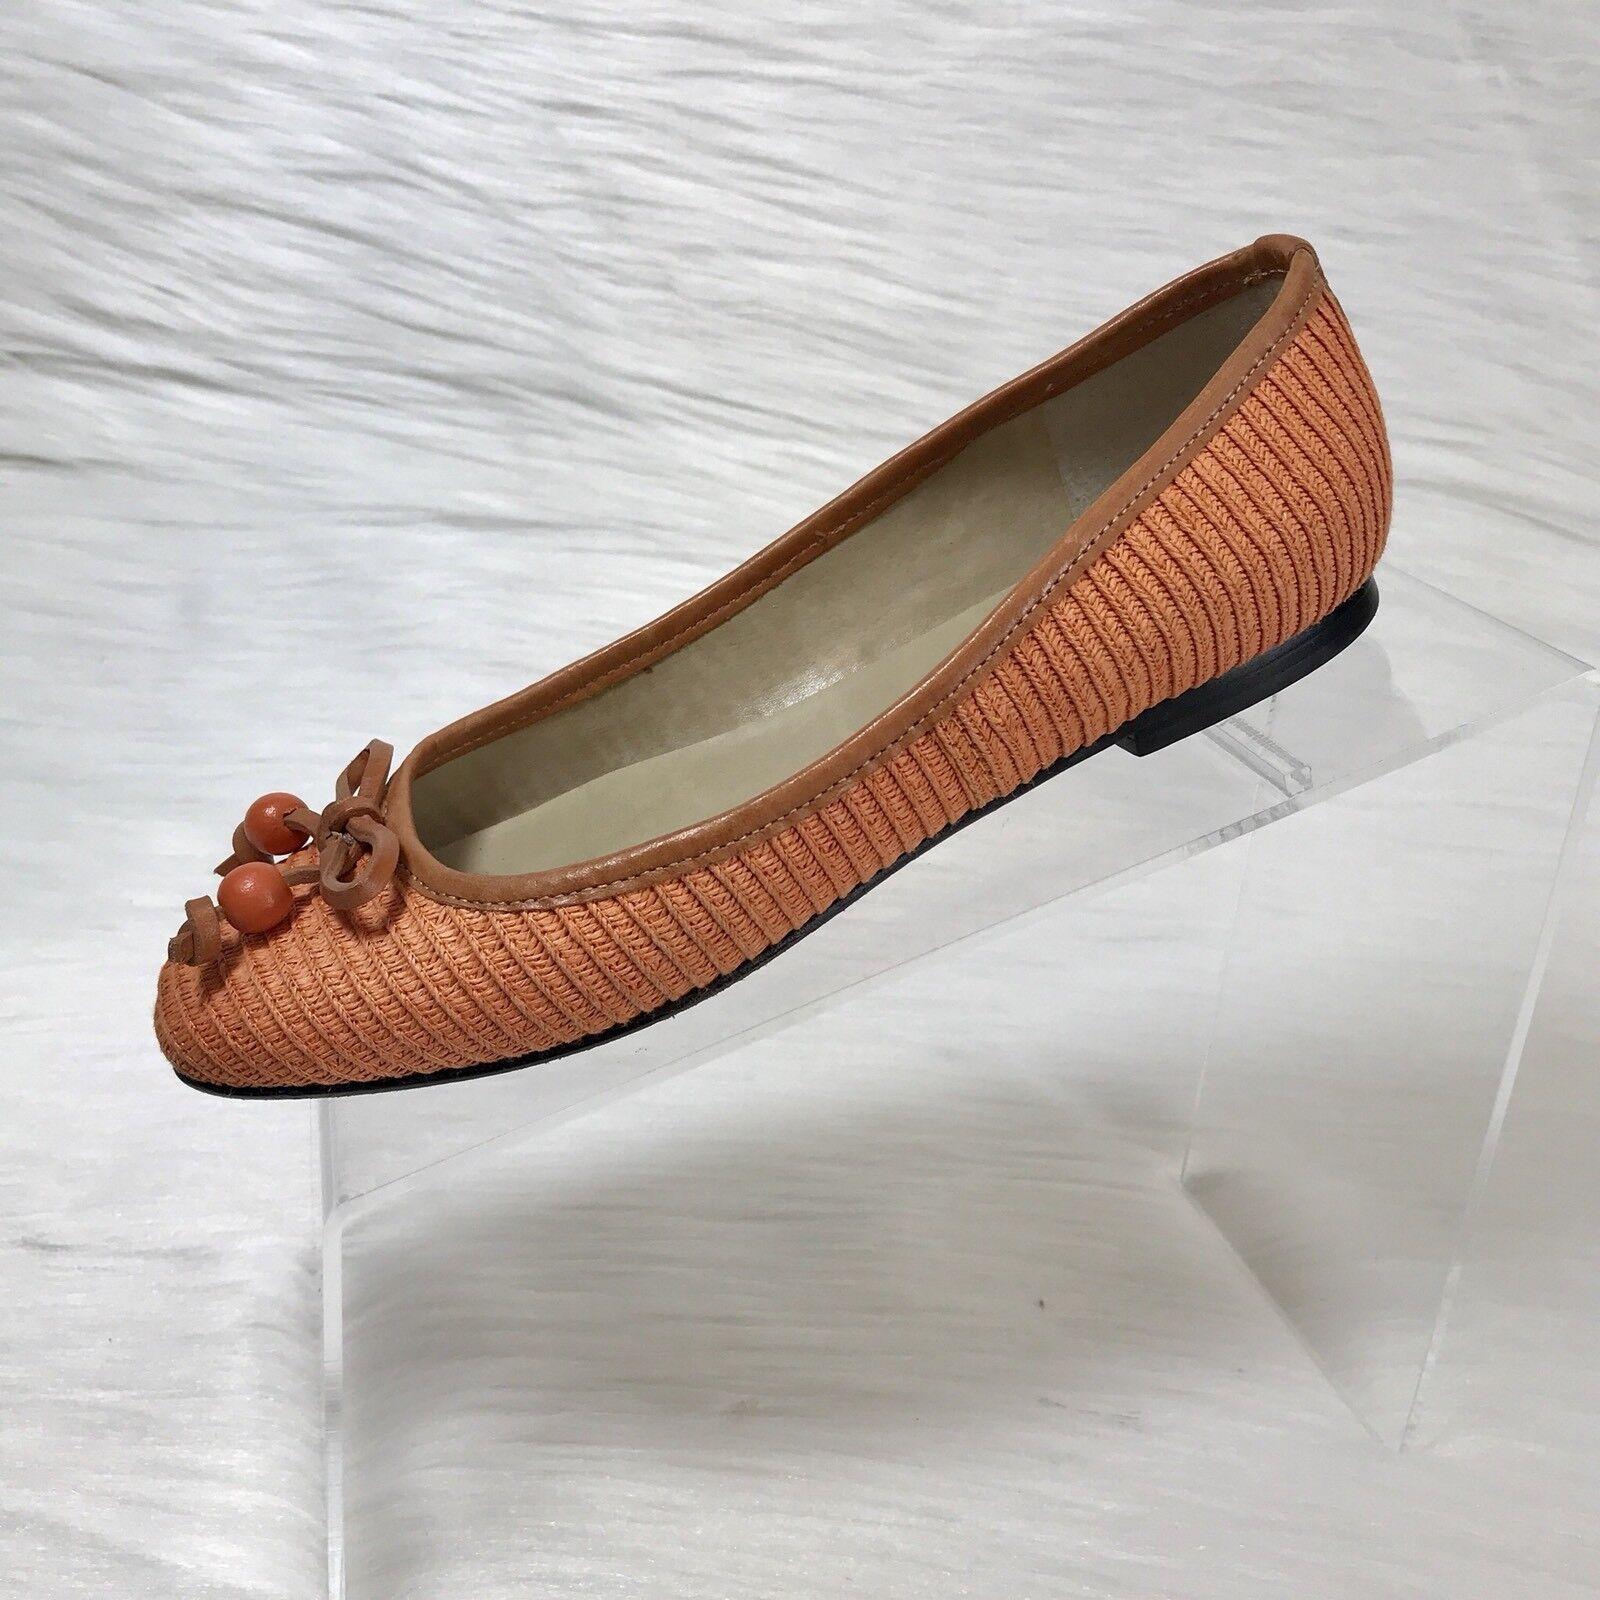 Talbots Women's Ballet Flats orange canvas  Slip On shoes Size 6 W